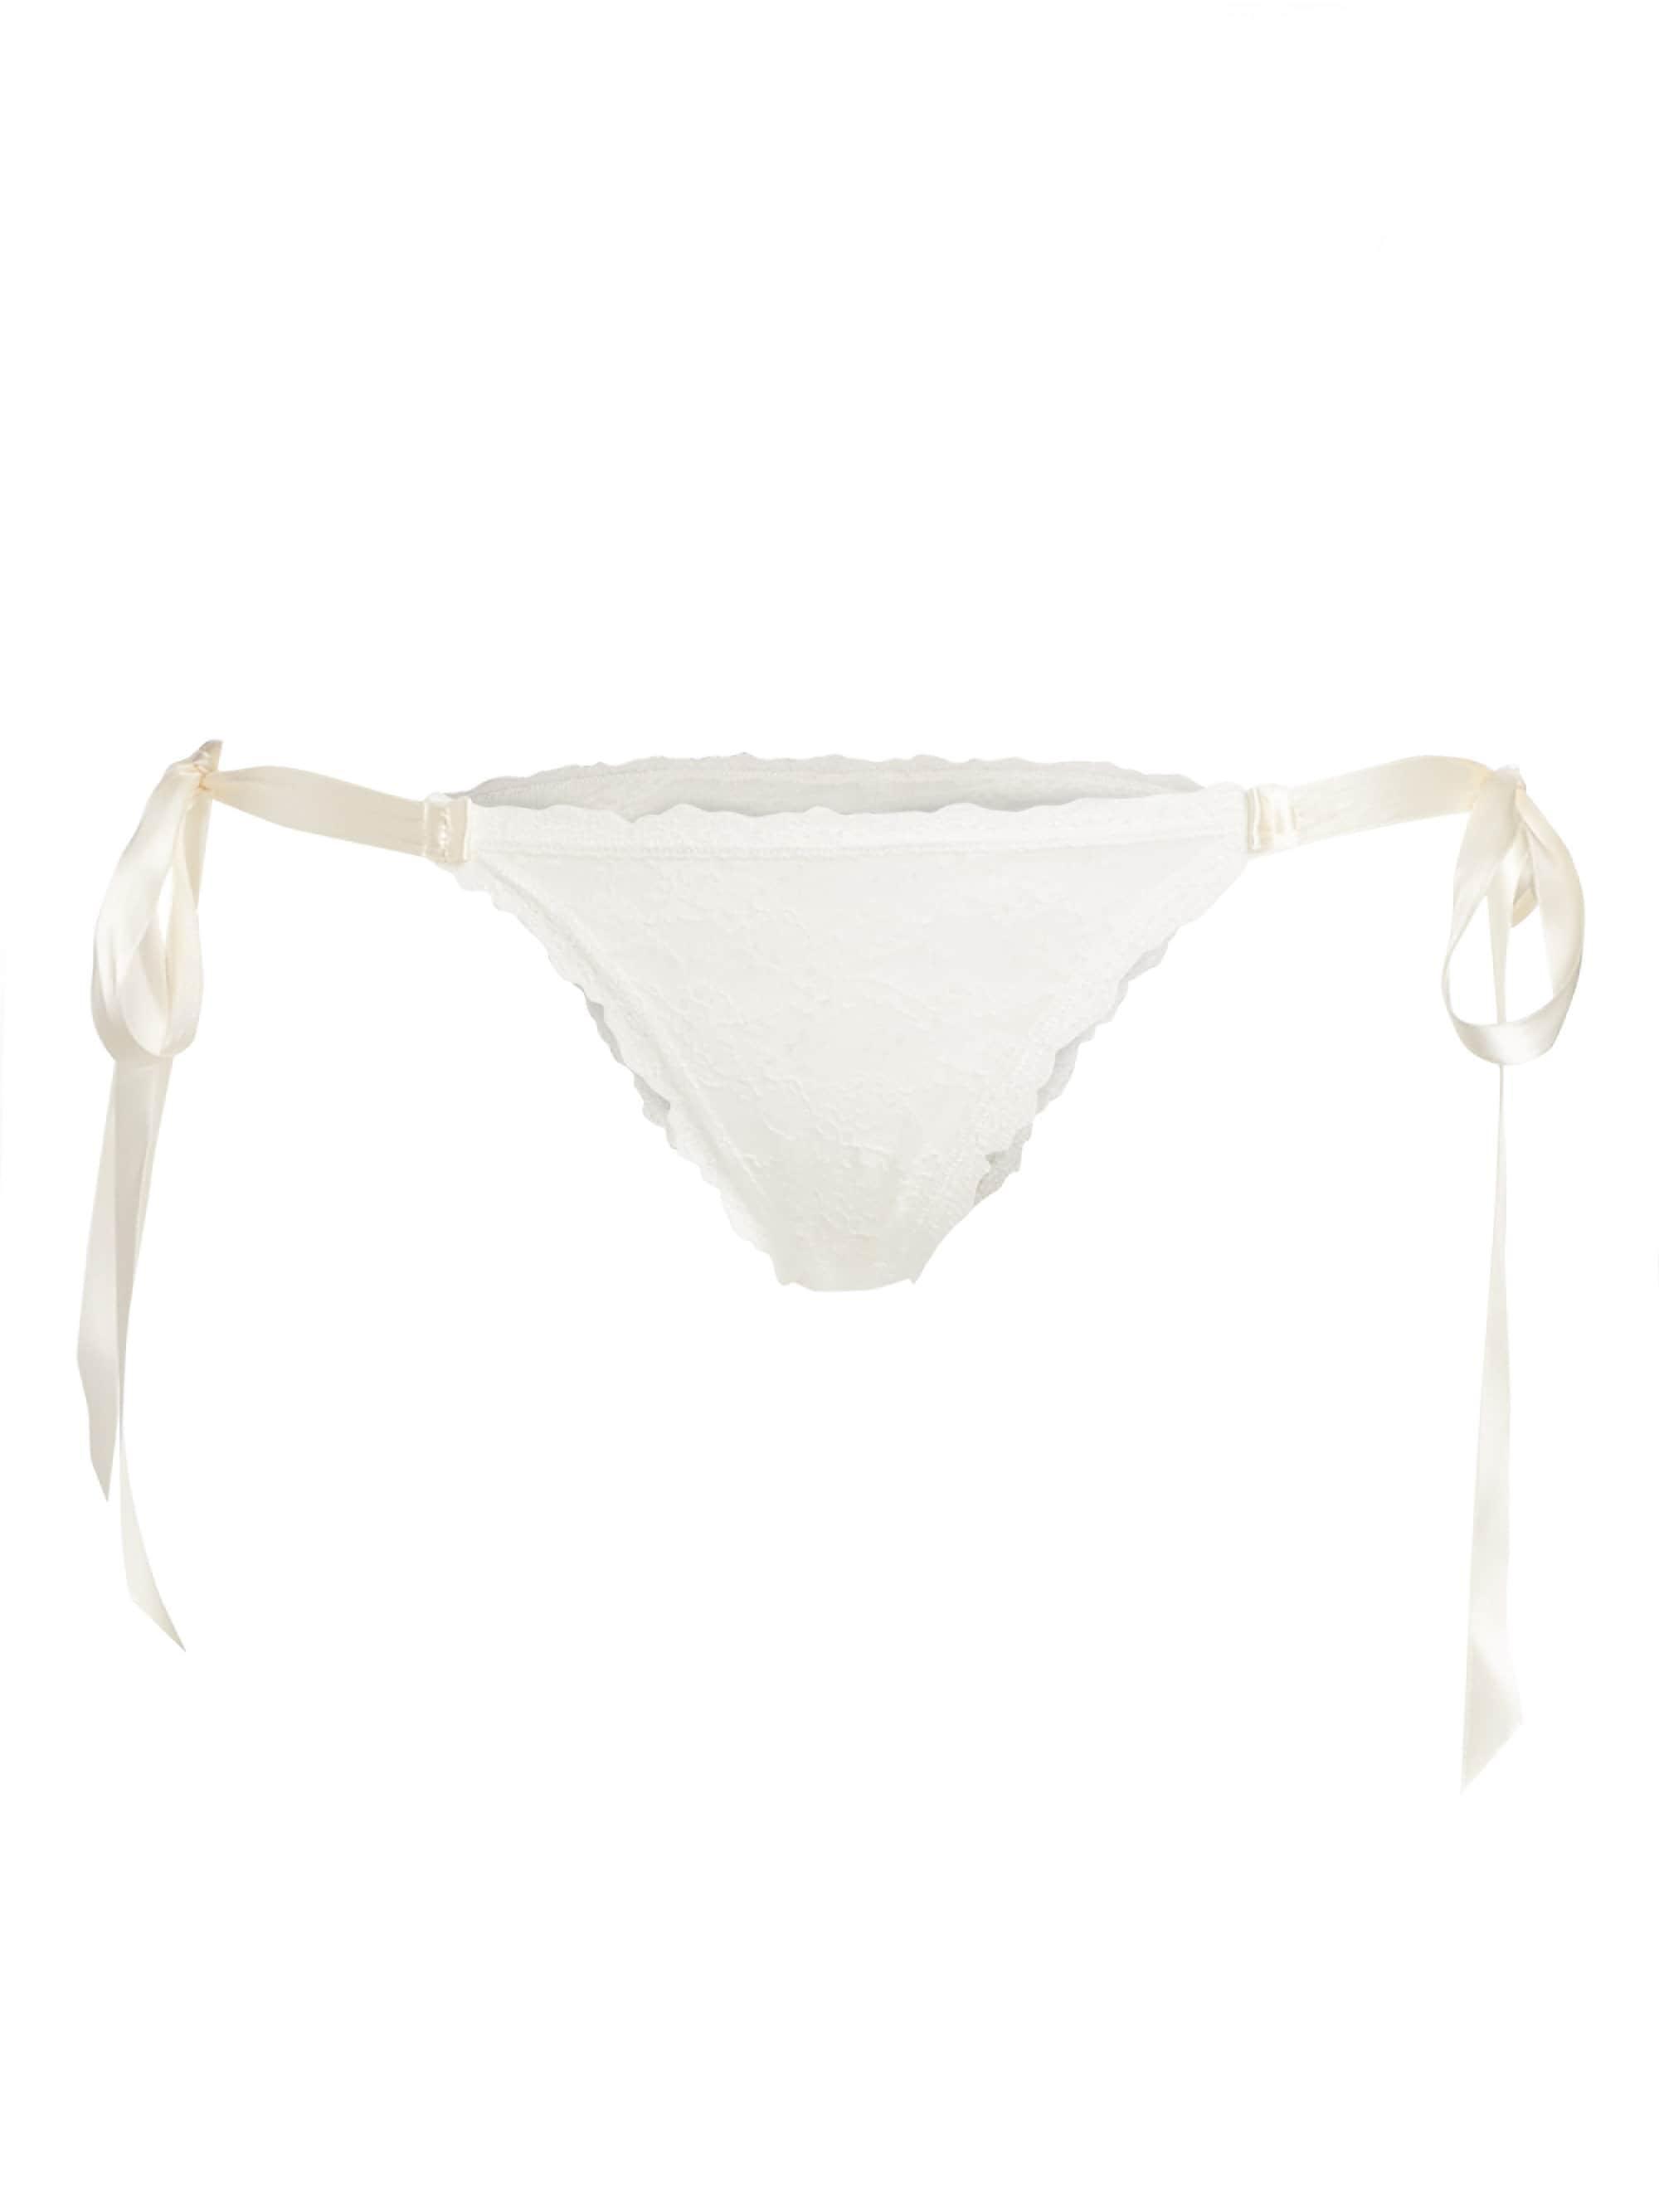 dffc679f5c9c Lyst - Hanky Panky Women's Lace Bikini Panties - Light Ivory - Size ...